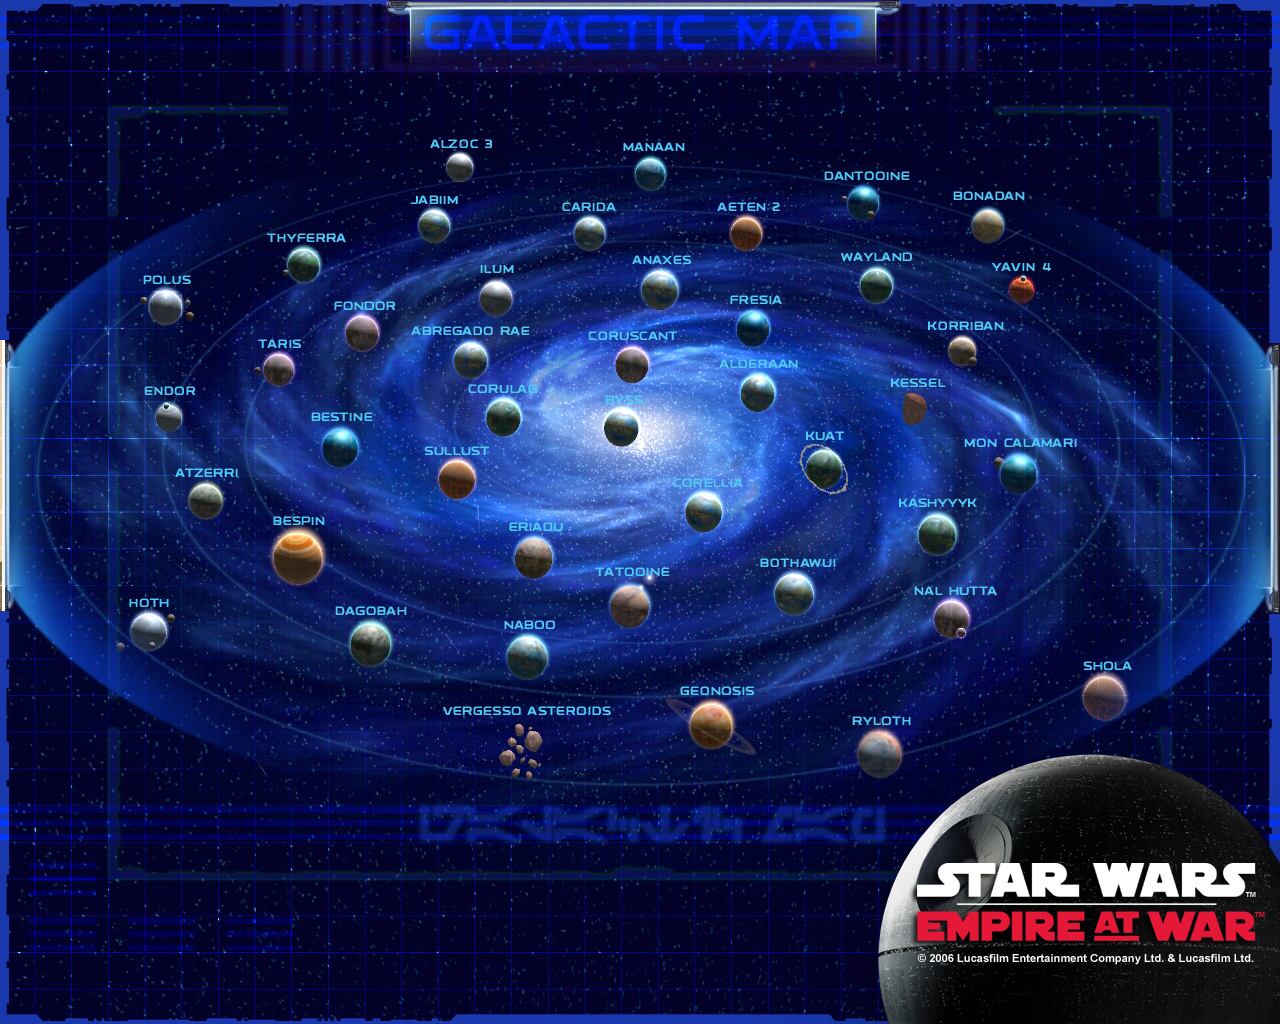 Epmire at war galactic map